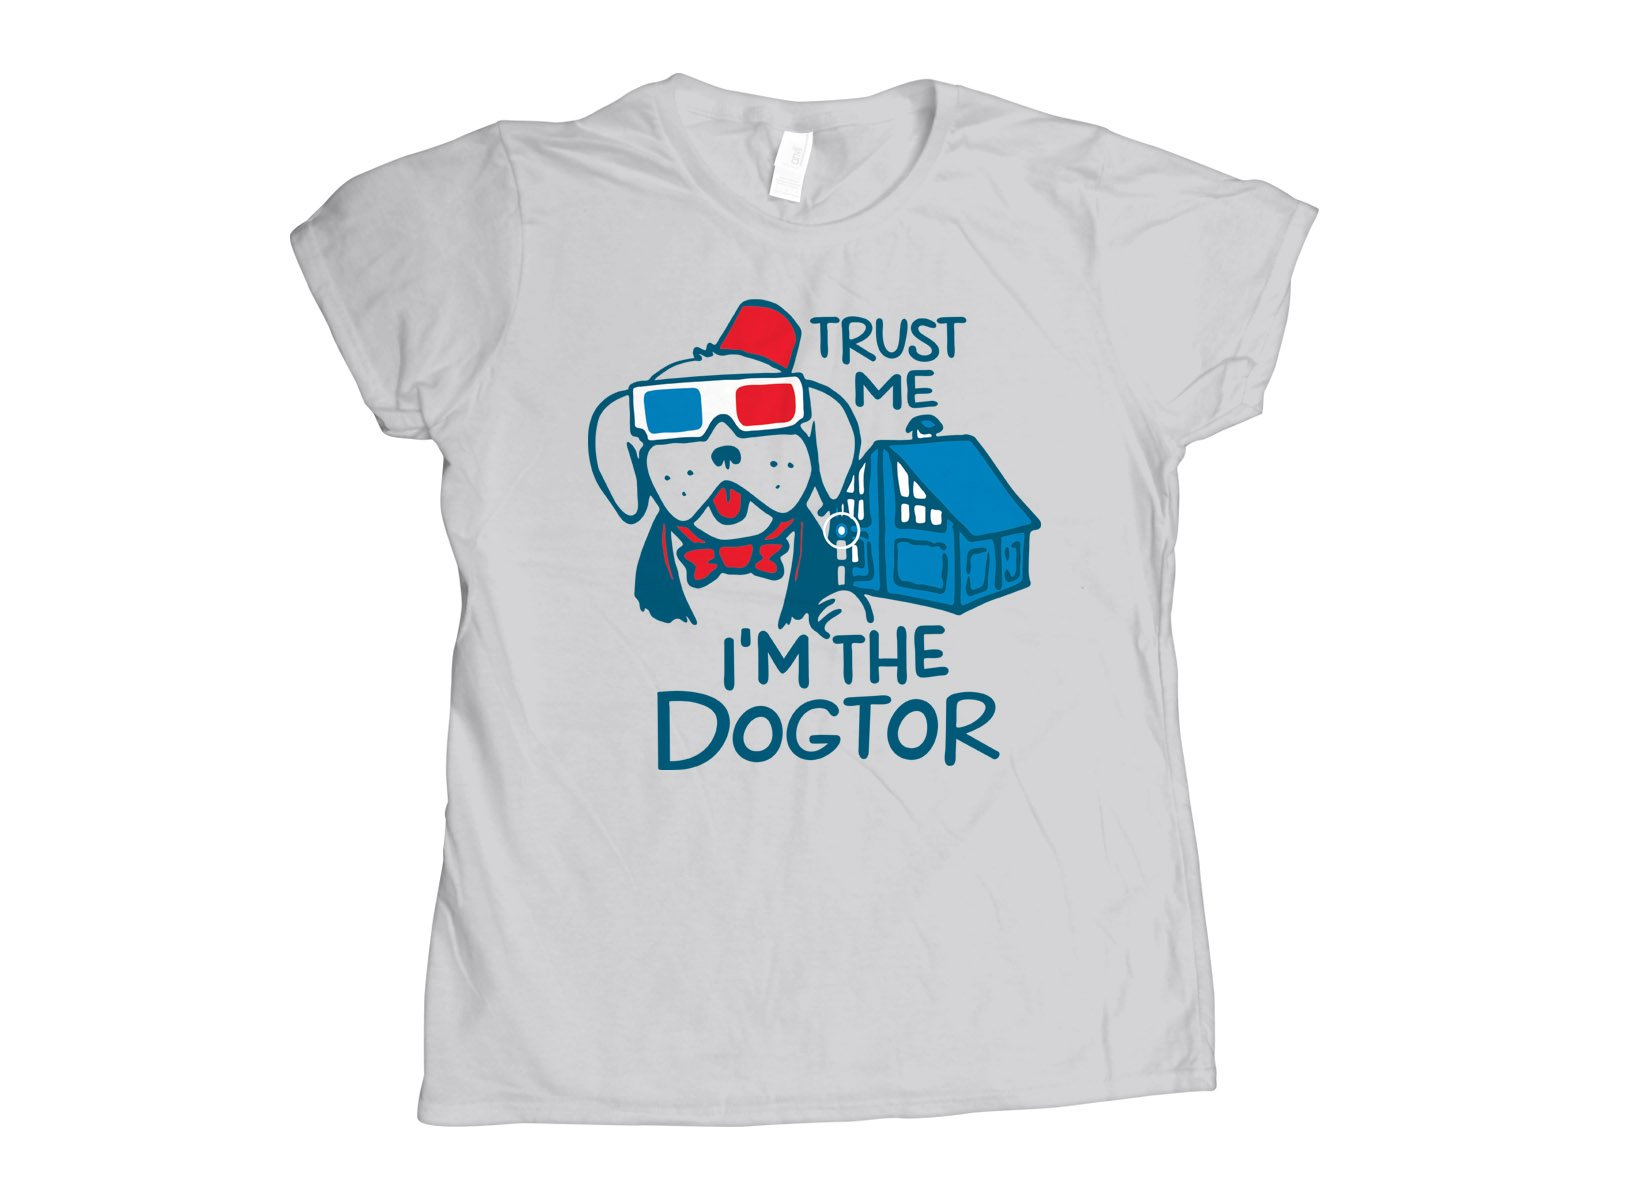 Trust Me, I'm The Dogtor on Womens T-Shirt